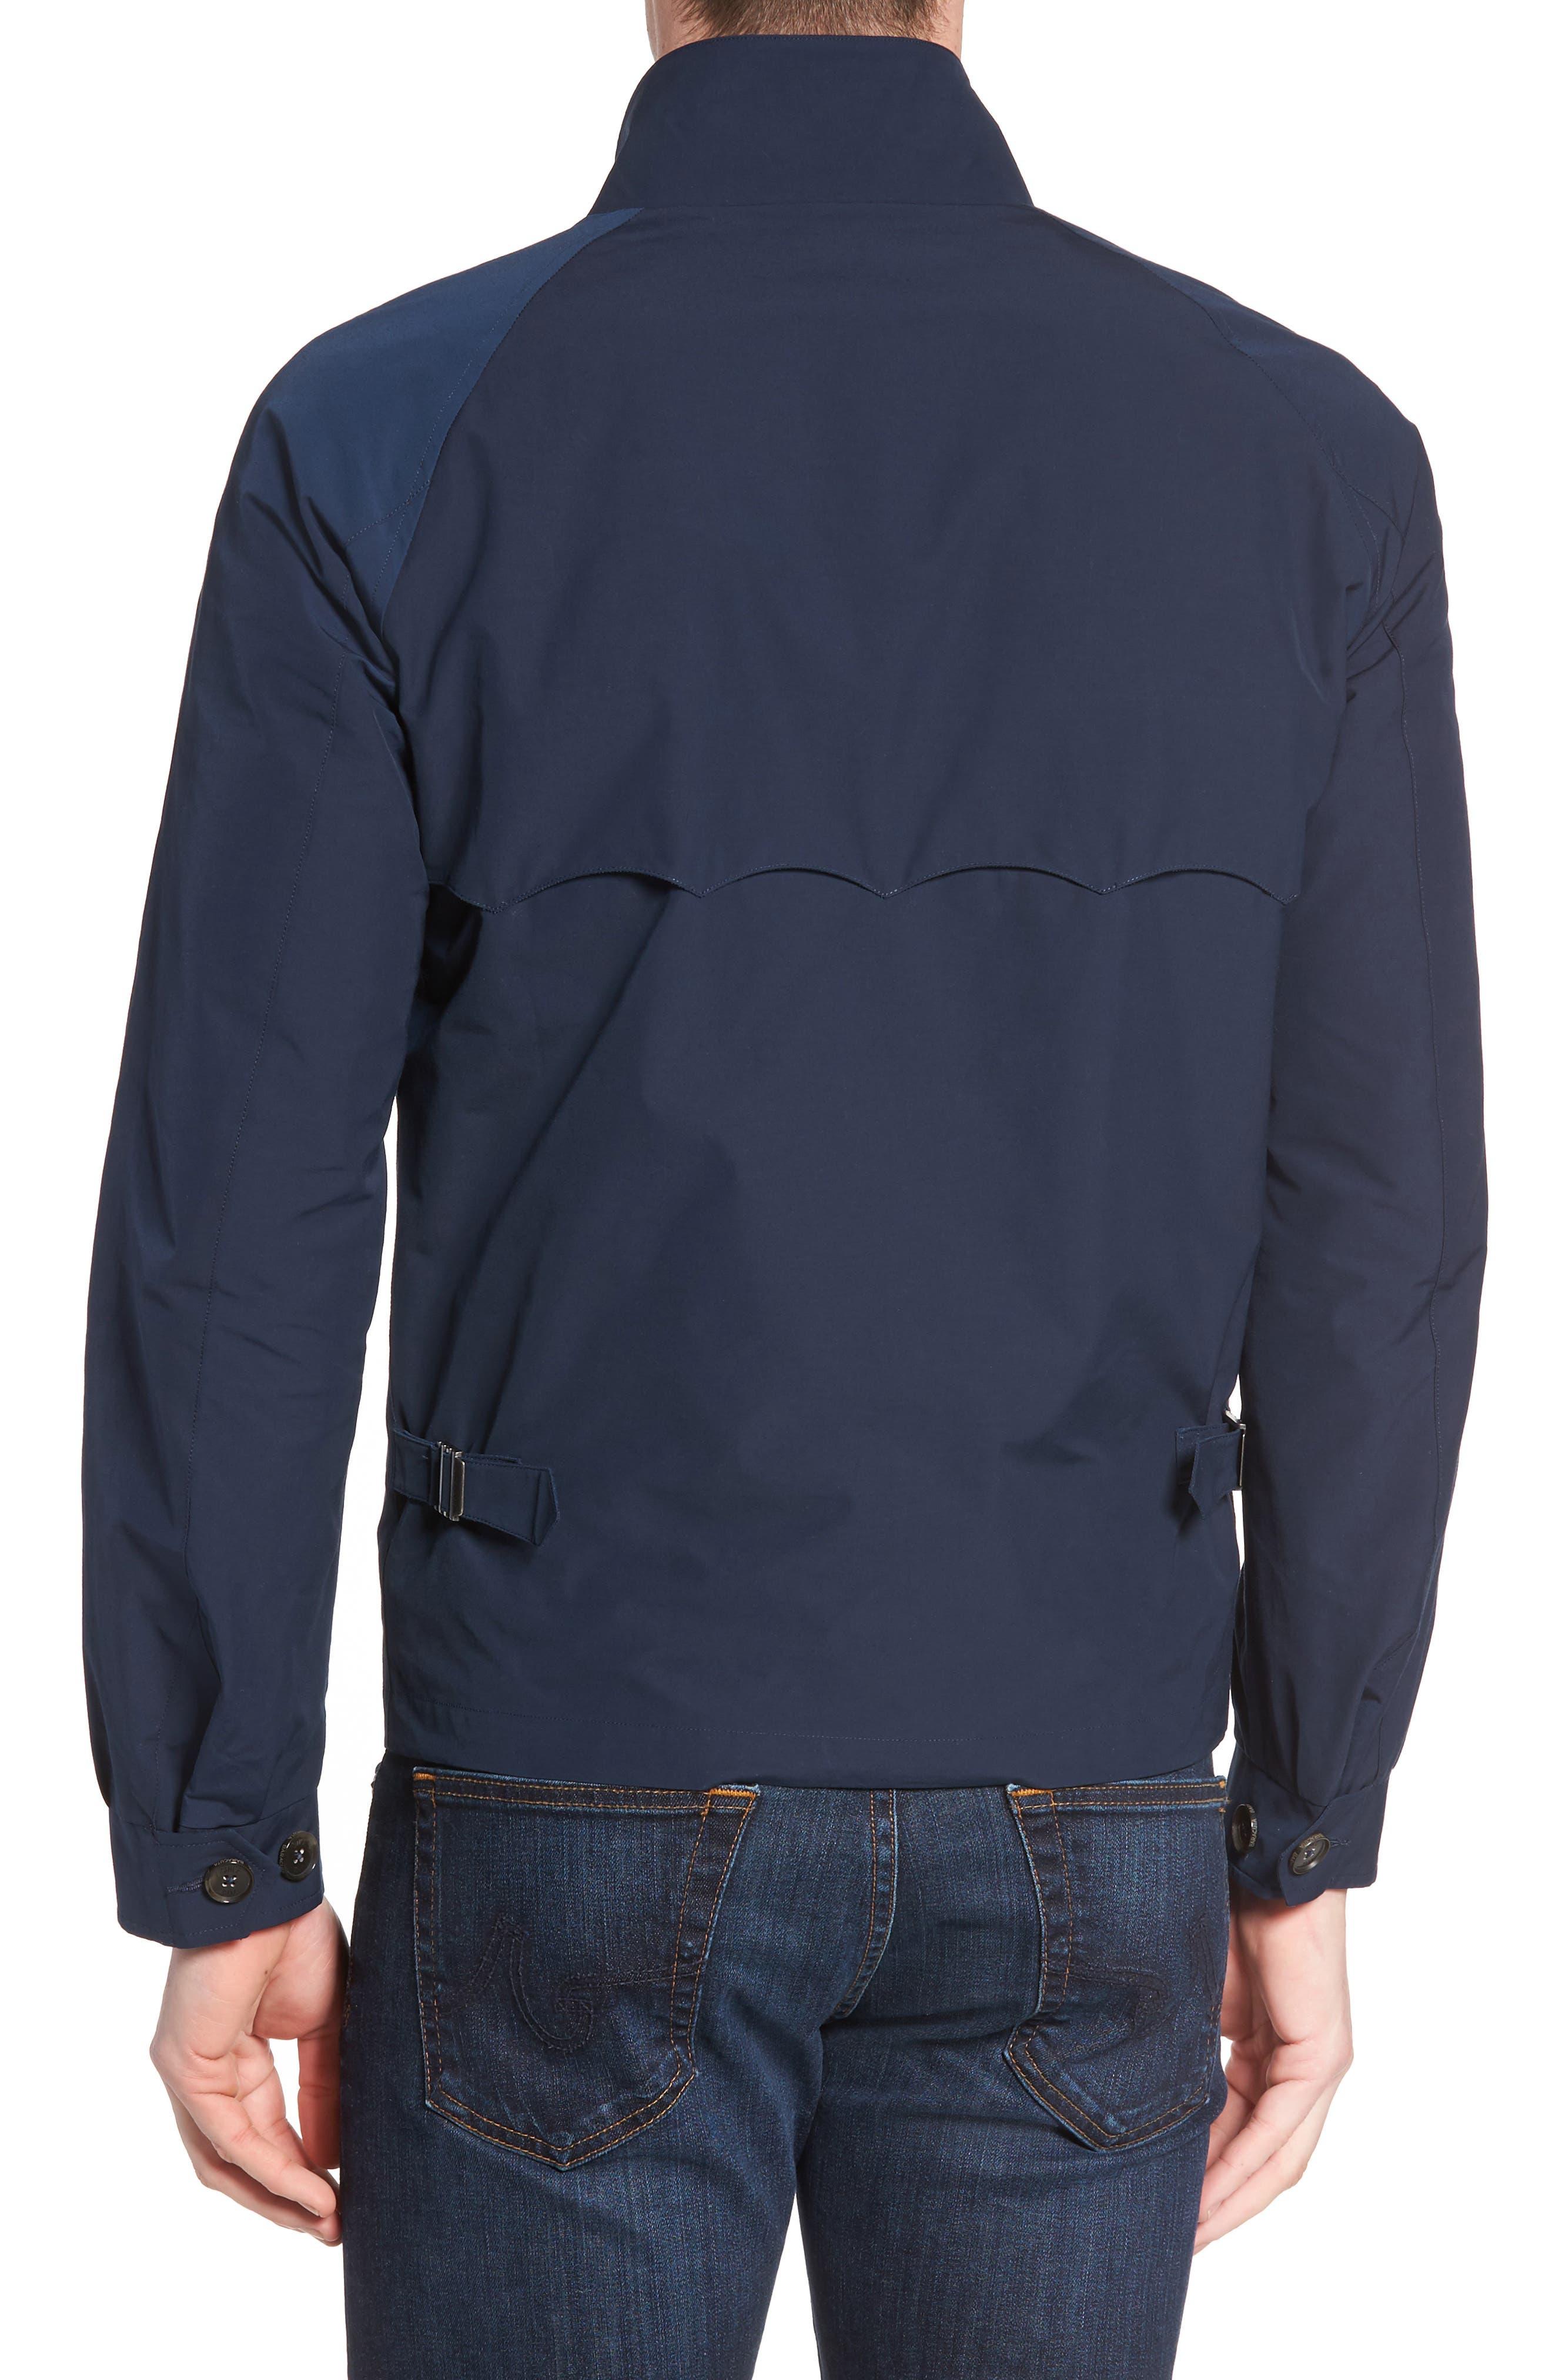 G4 Water Repellent Harrington Jacket,                             Alternate thumbnail 2, color,                             Navy